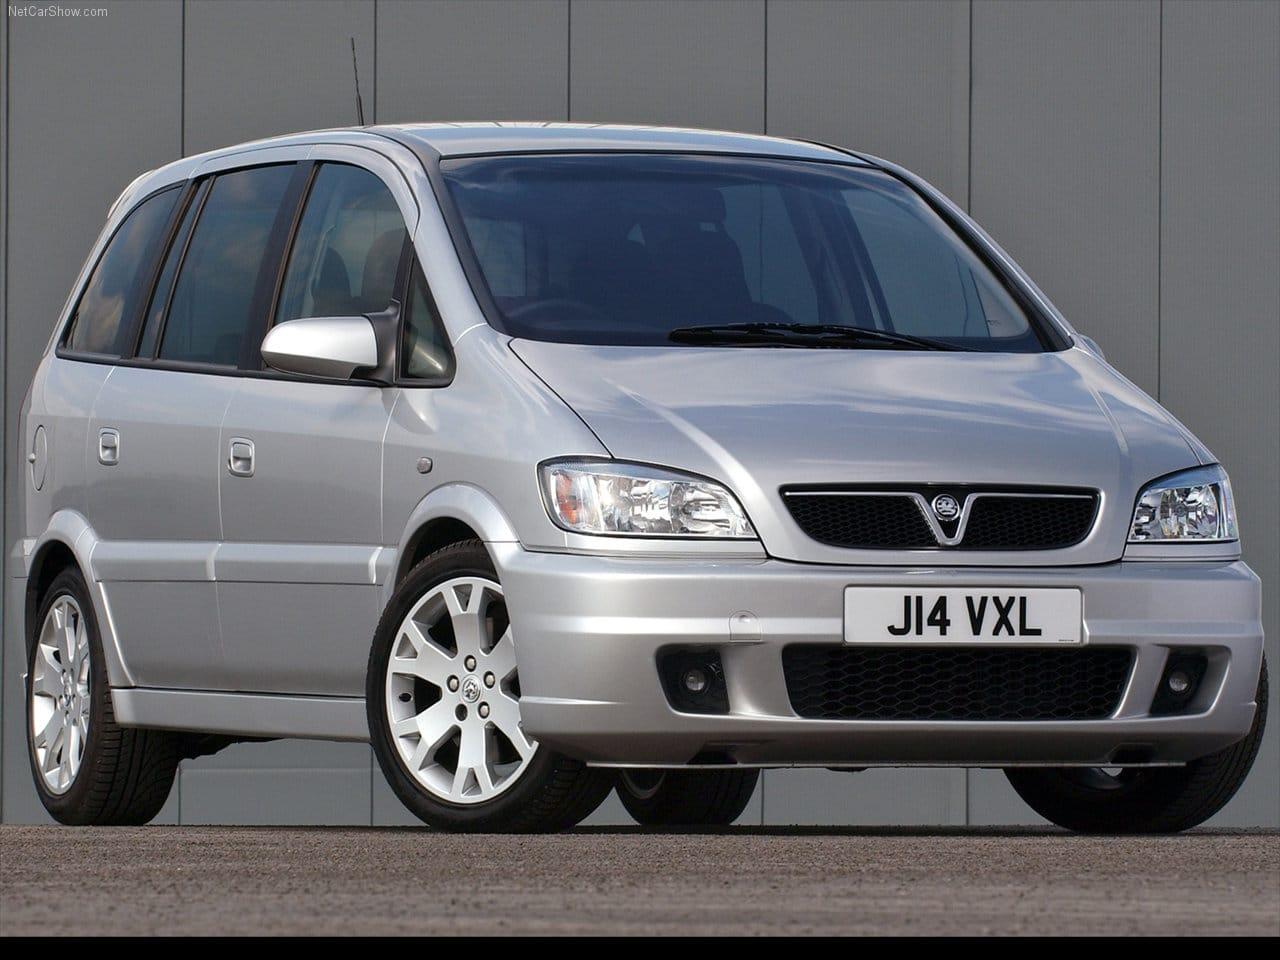 Vauxhall Zafira GSi, Vauxhall Zafira, Vauxhall, Zafira, Zafira GSi, GSi, people carrier, family car, motoring, automotive, car, cars, retor car classic car, autotrader, ebay motors, car for sale, cheap cars, car design, fun car, fast car, hot hatch